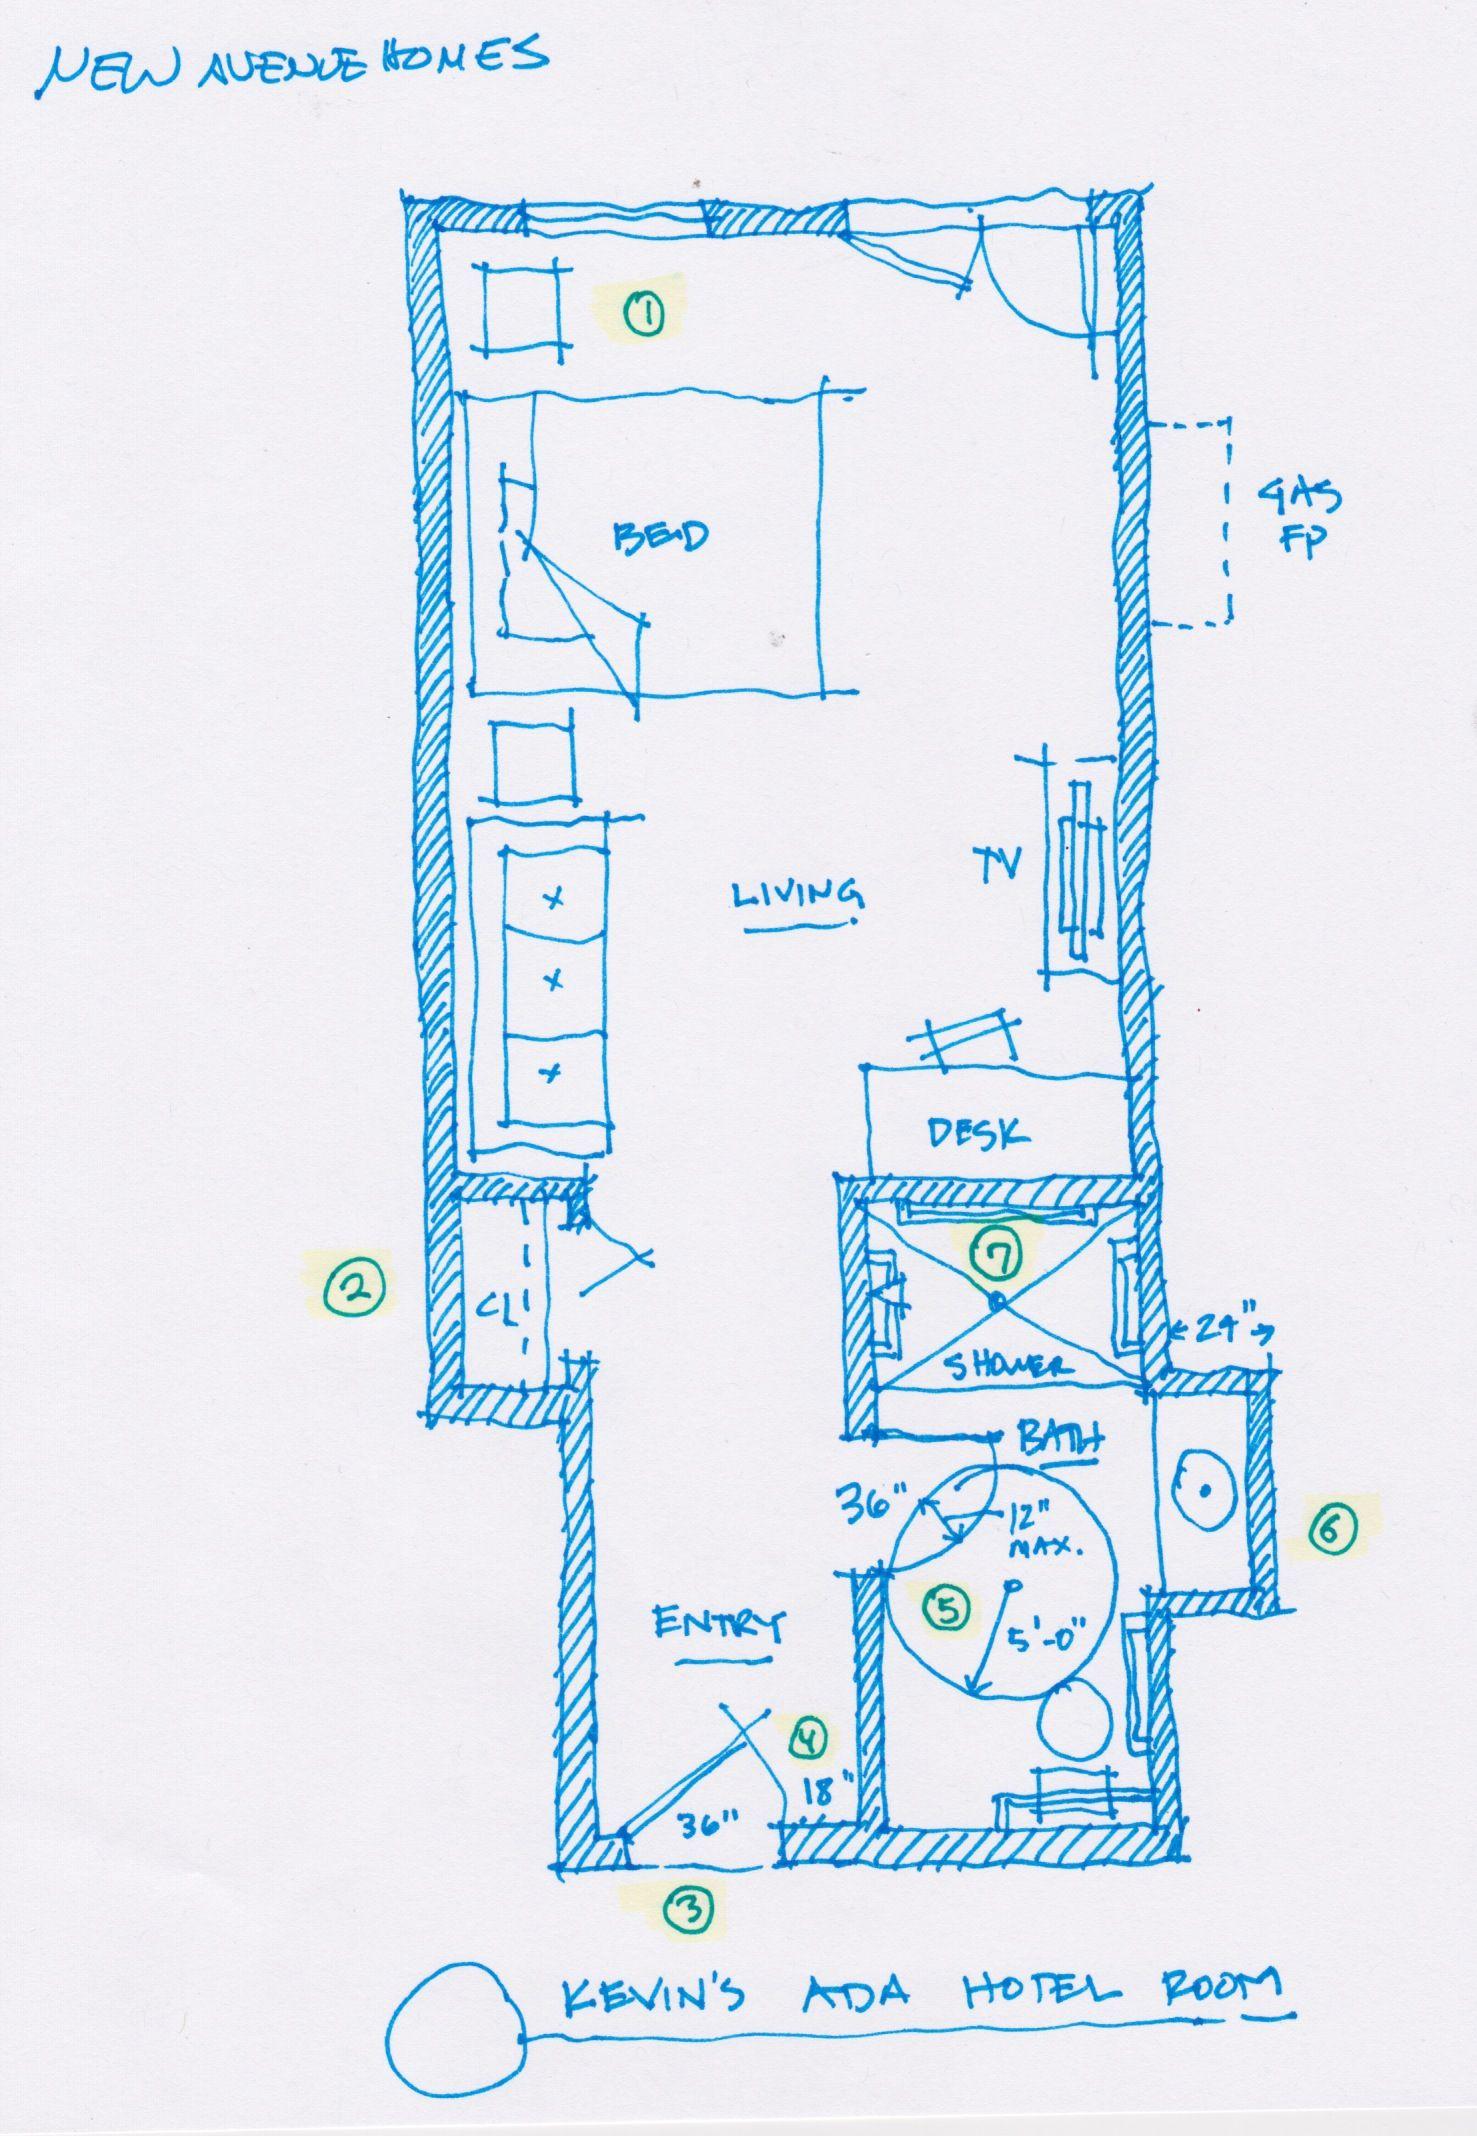 Ada bathroom floor plans - Hotel Room Ada Floorplans Google Search